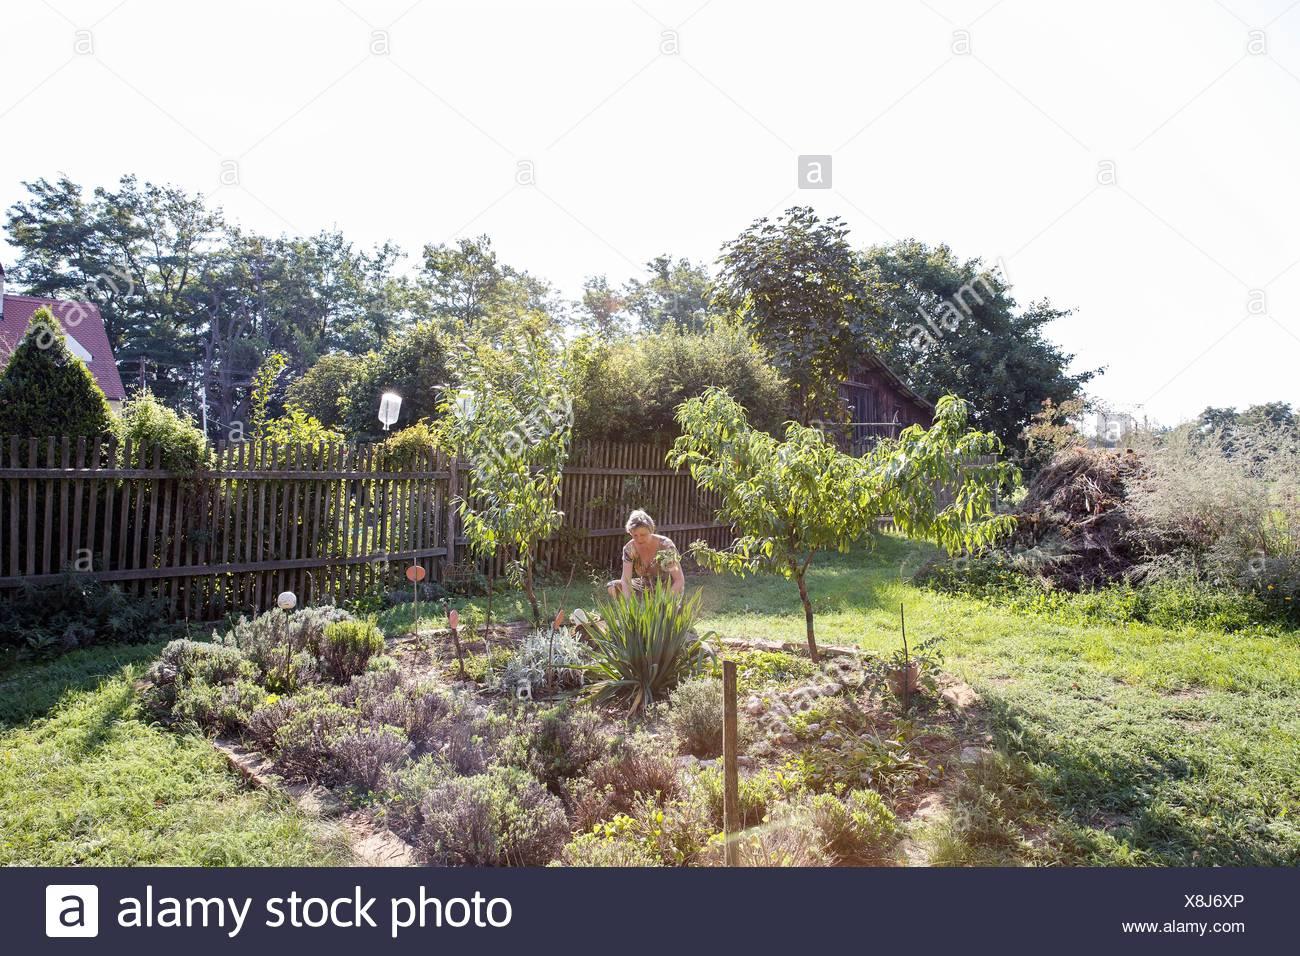 Mature woman gardening - Stock Image